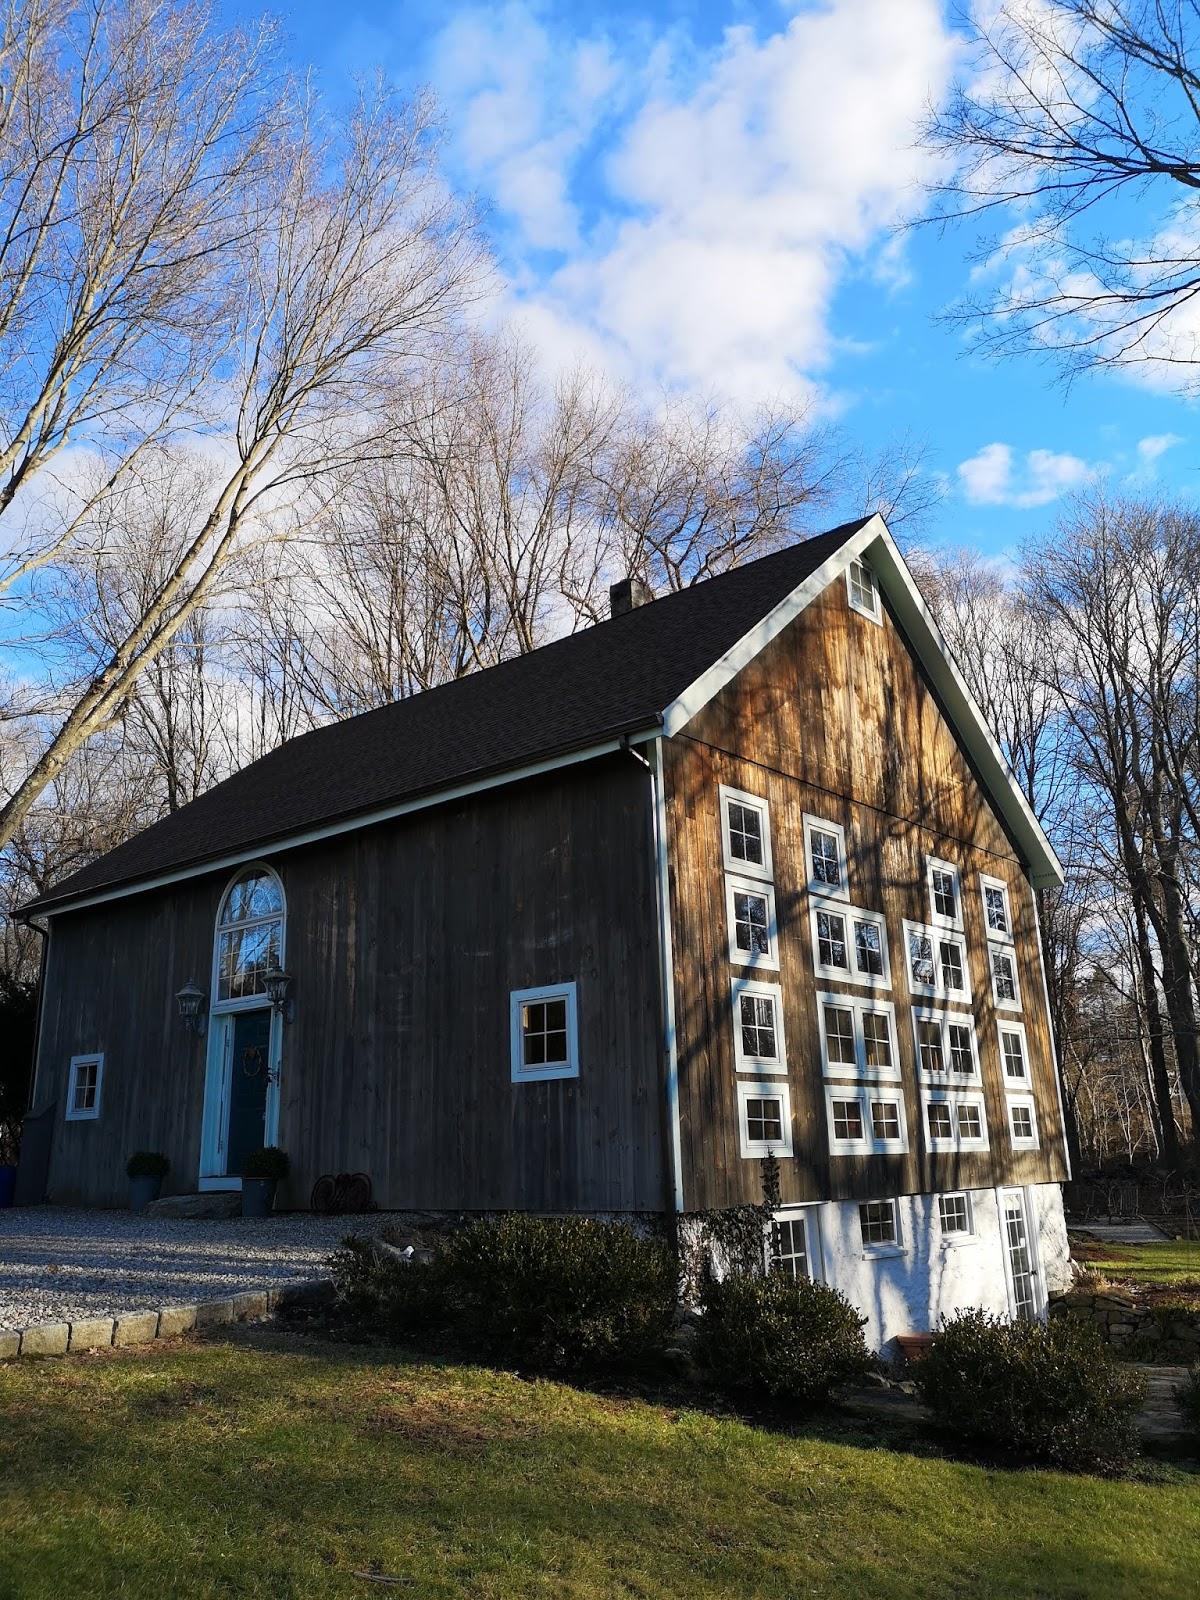 Converted Barn Airbnb Rental